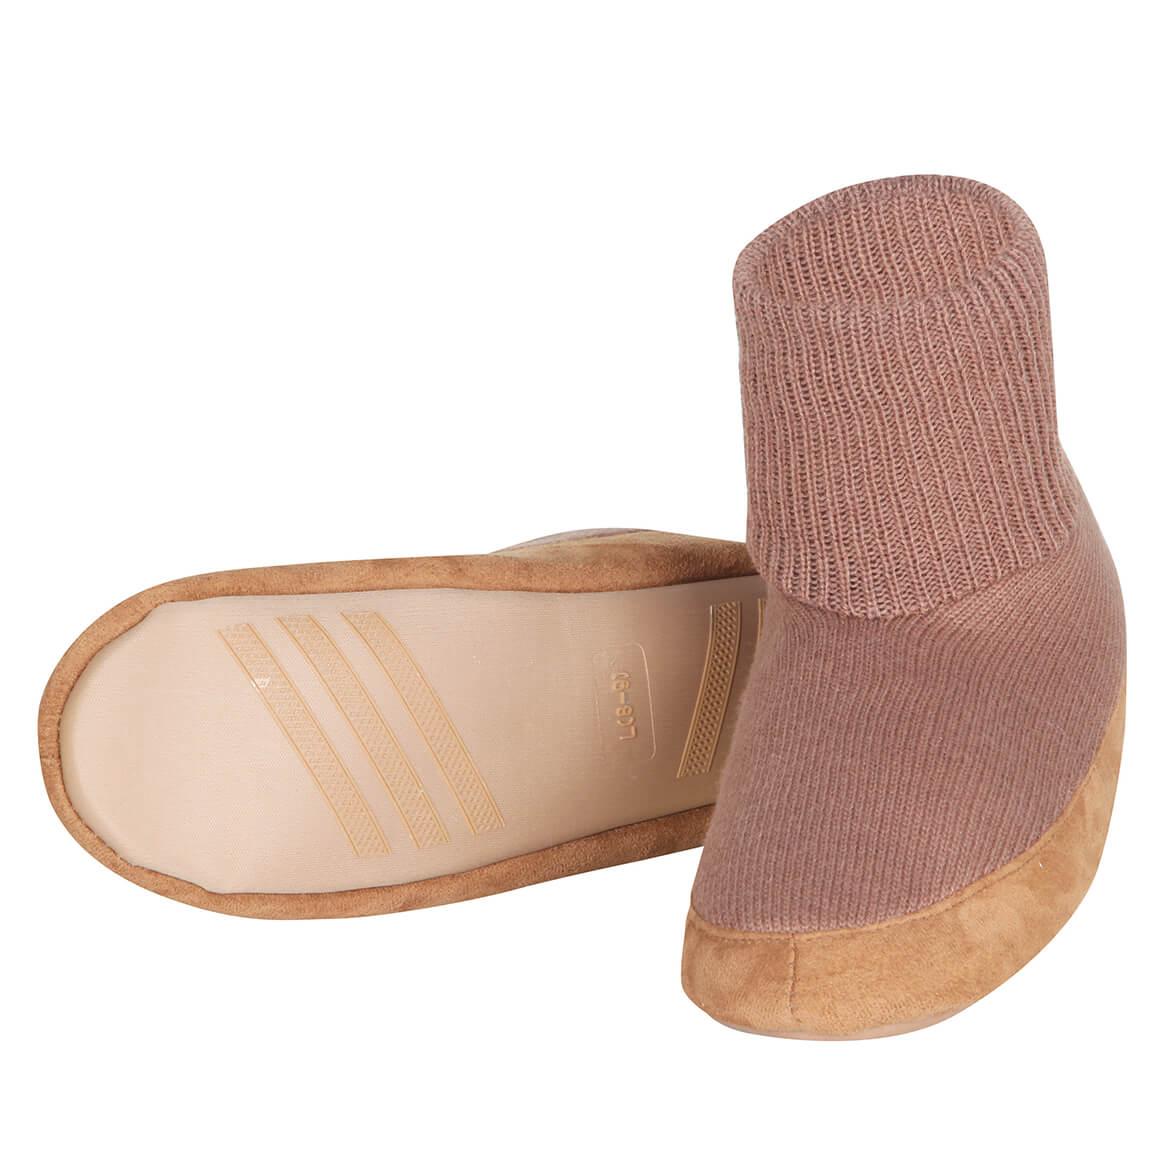 Women's Cardigan Slippers-335465